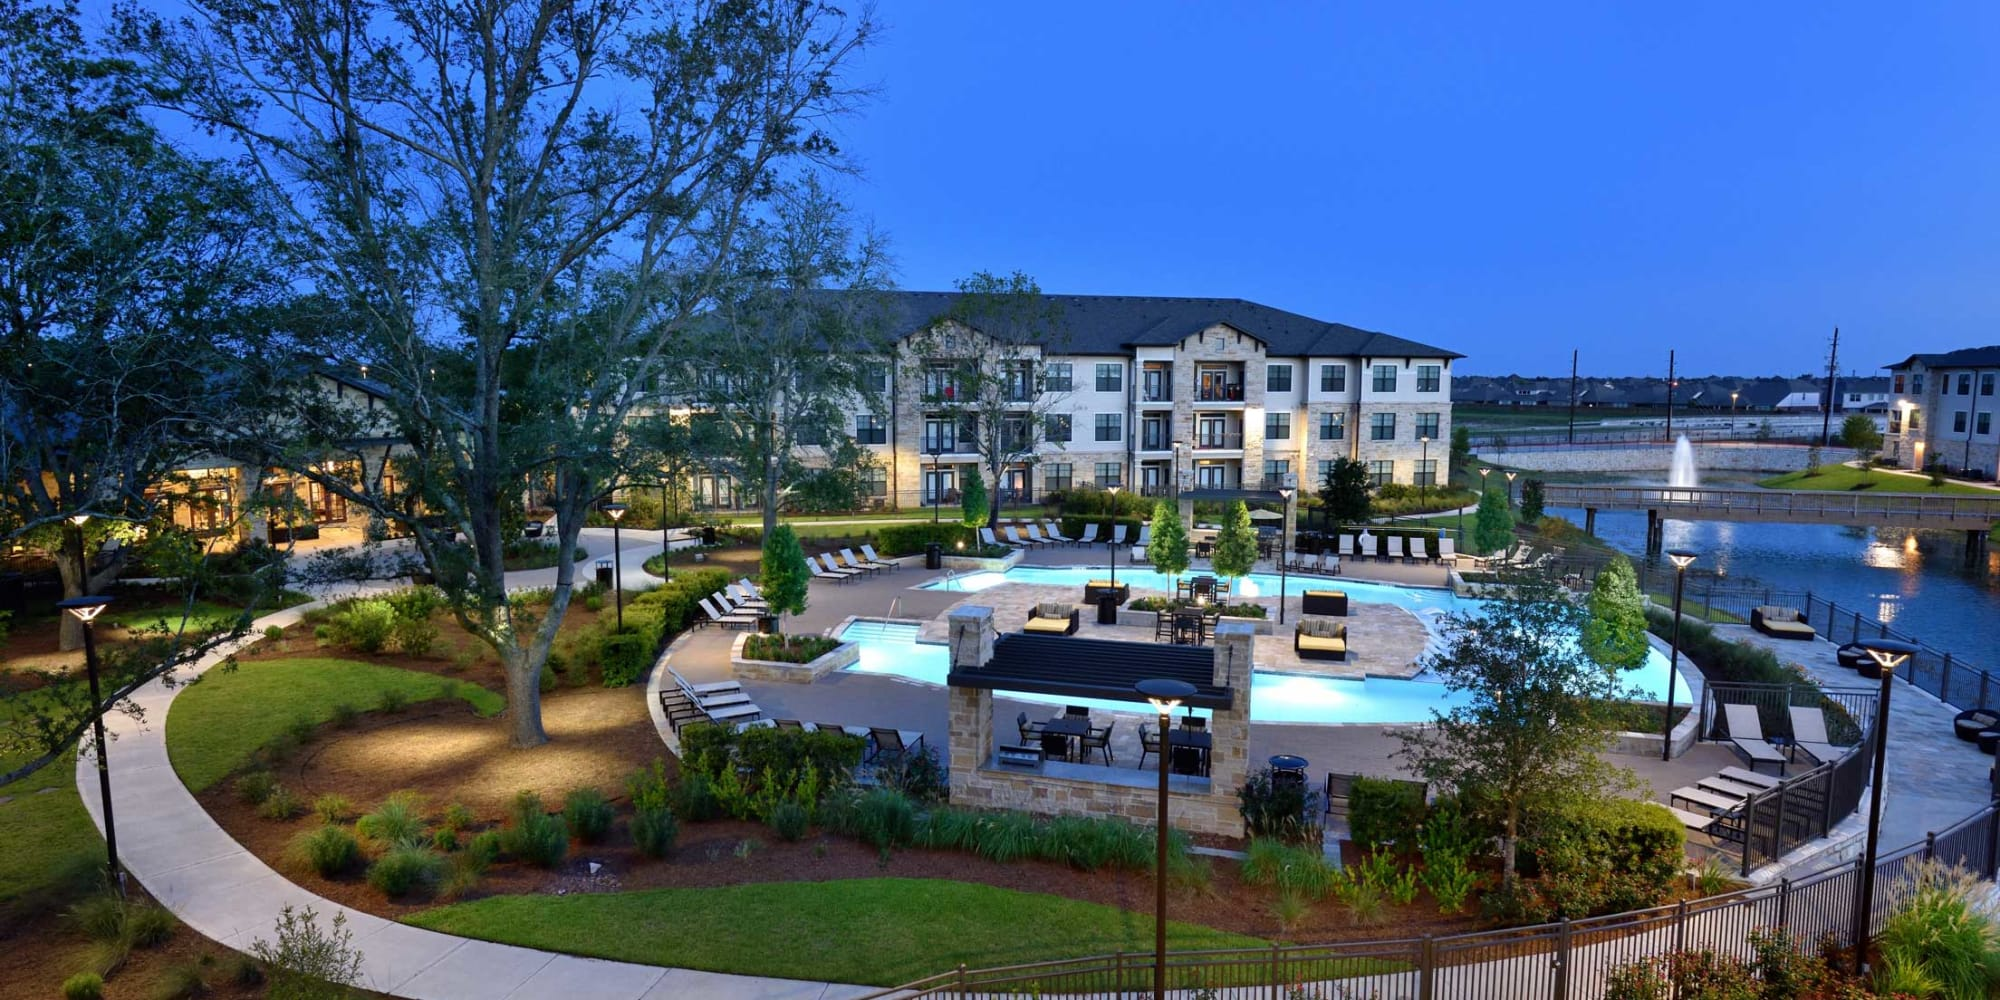 Olympus Falcon Landing apartments in Katy, Texas